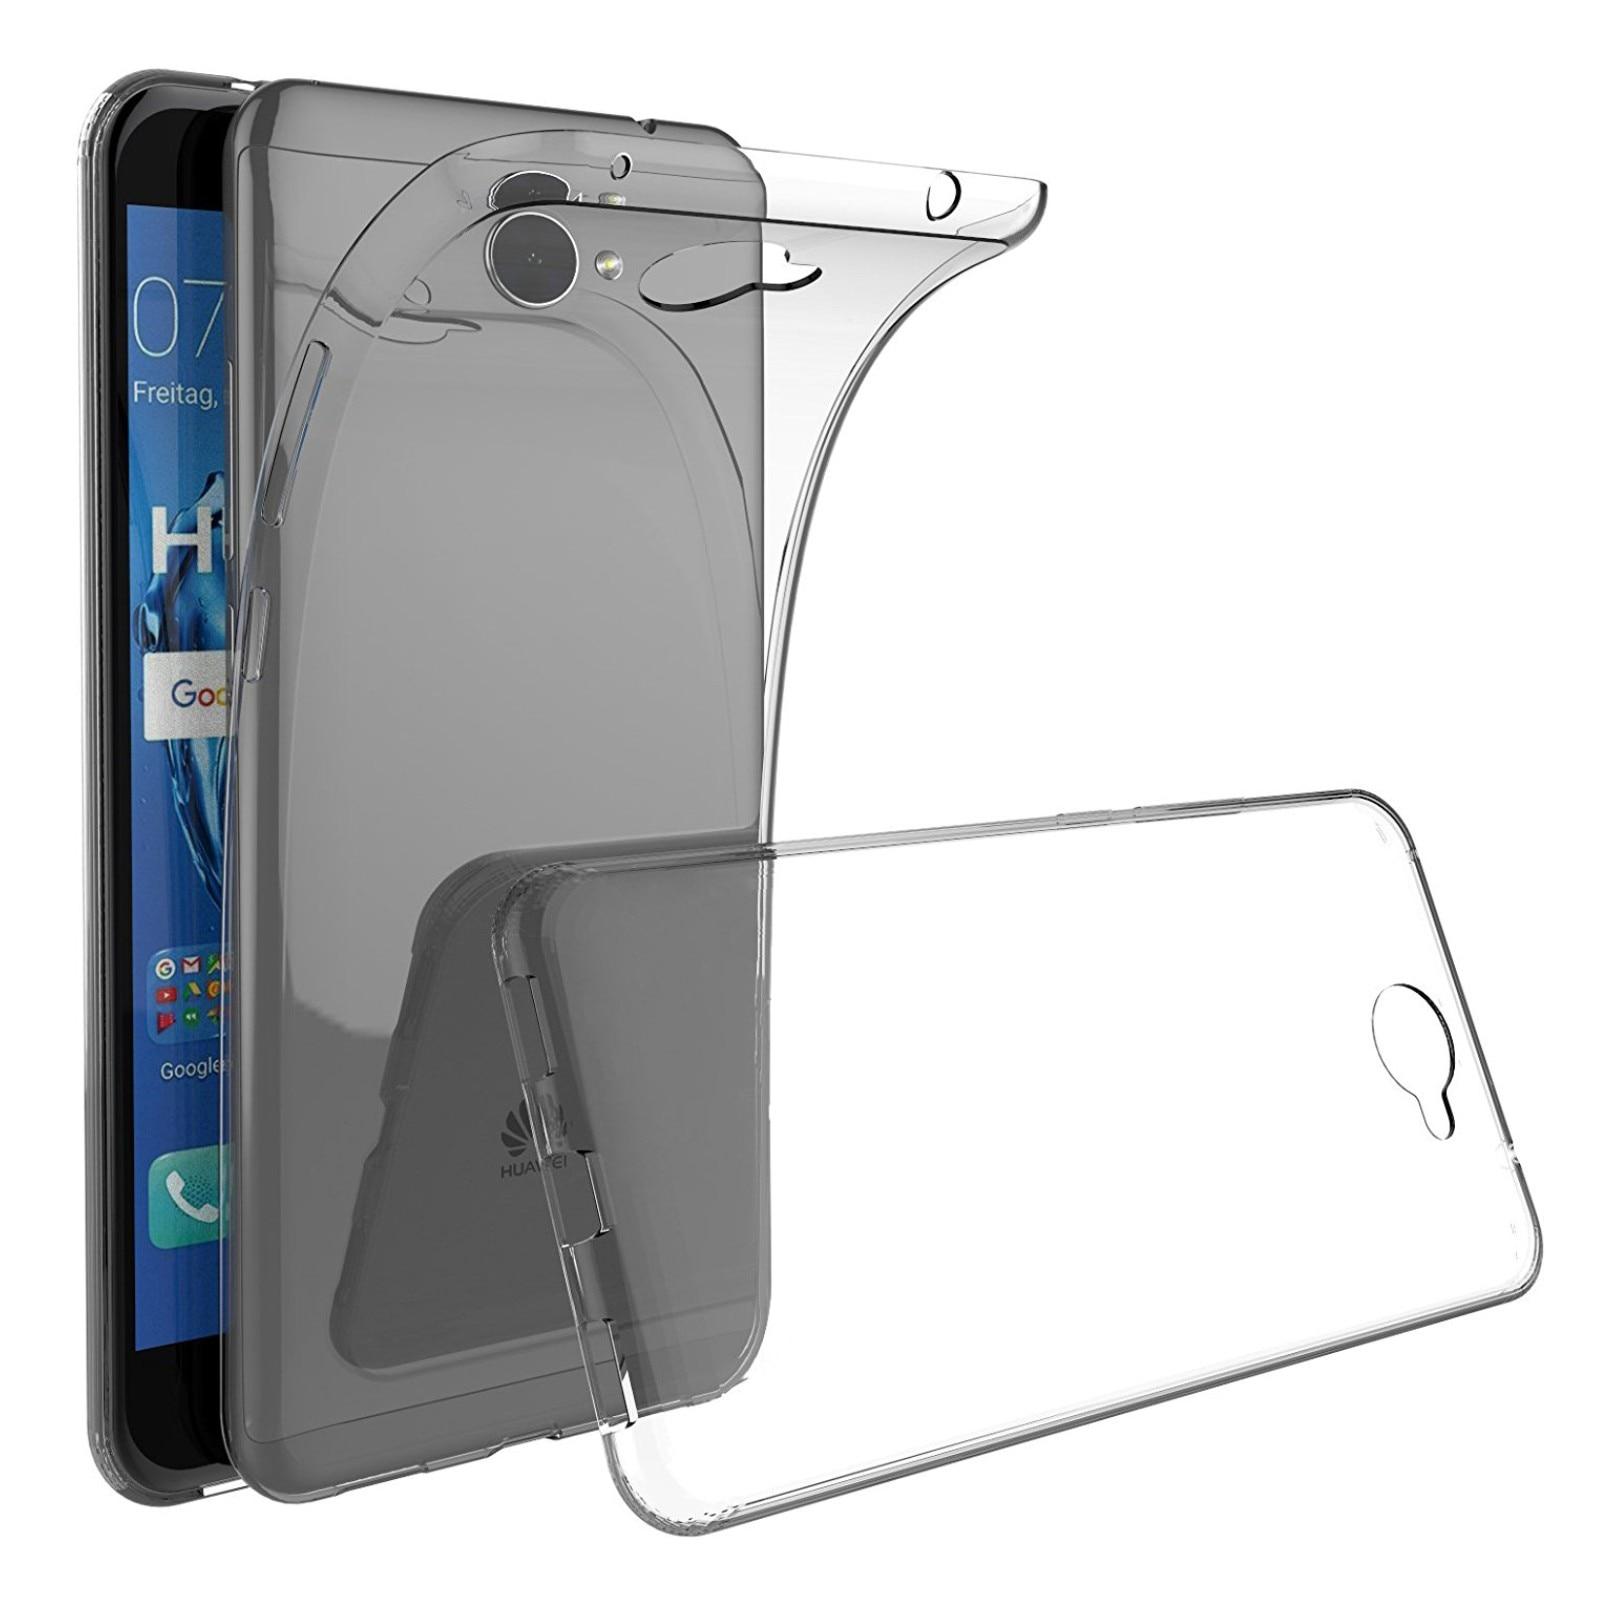 2623d35fc1b Funda de gel TPU carcasa silicona para movil Huawei Y7 2017 TRANSPARENTE